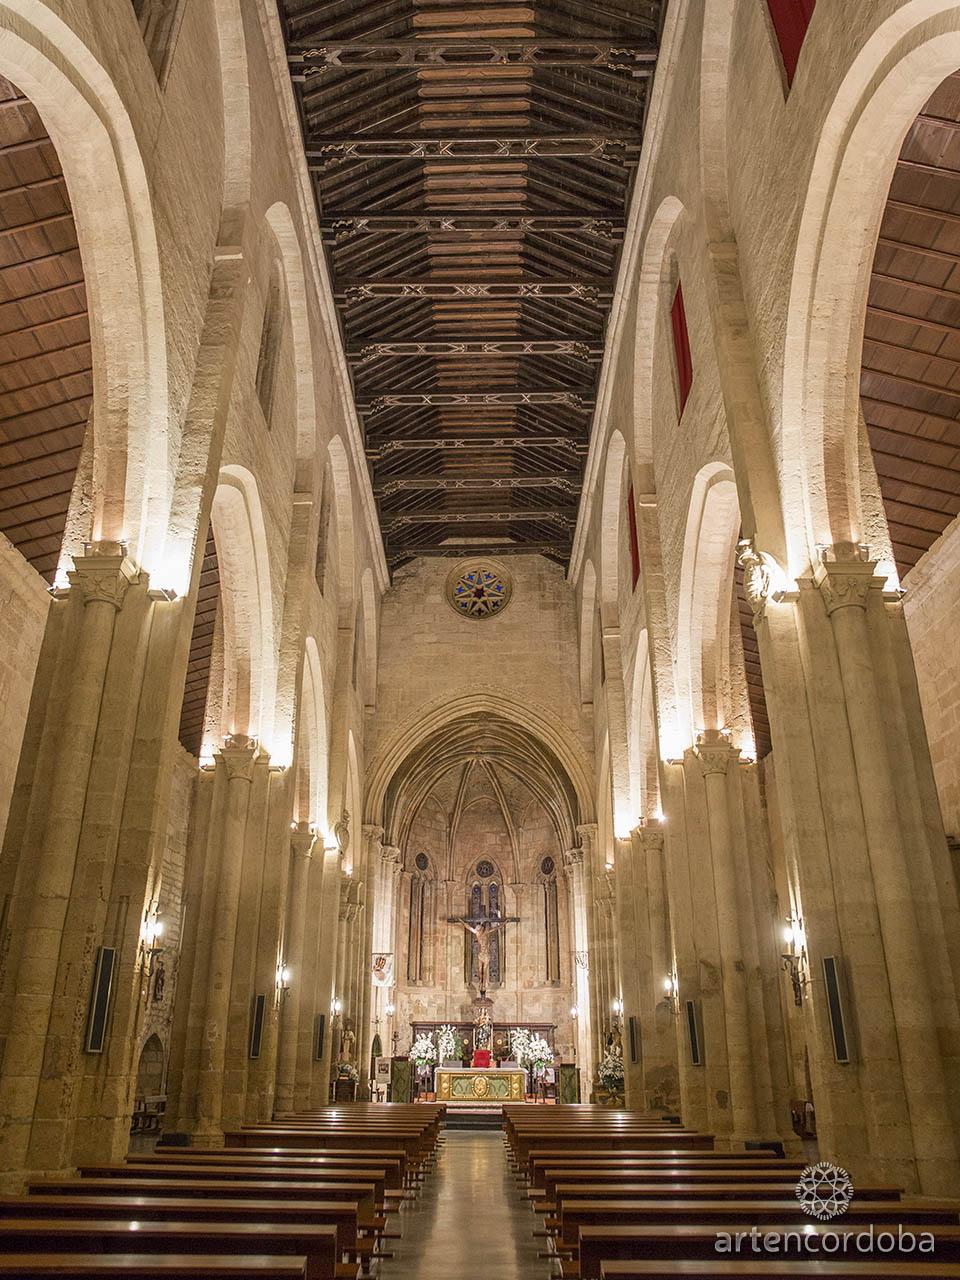 Nave central de la Iglesia de Santa Marina en Córdoba